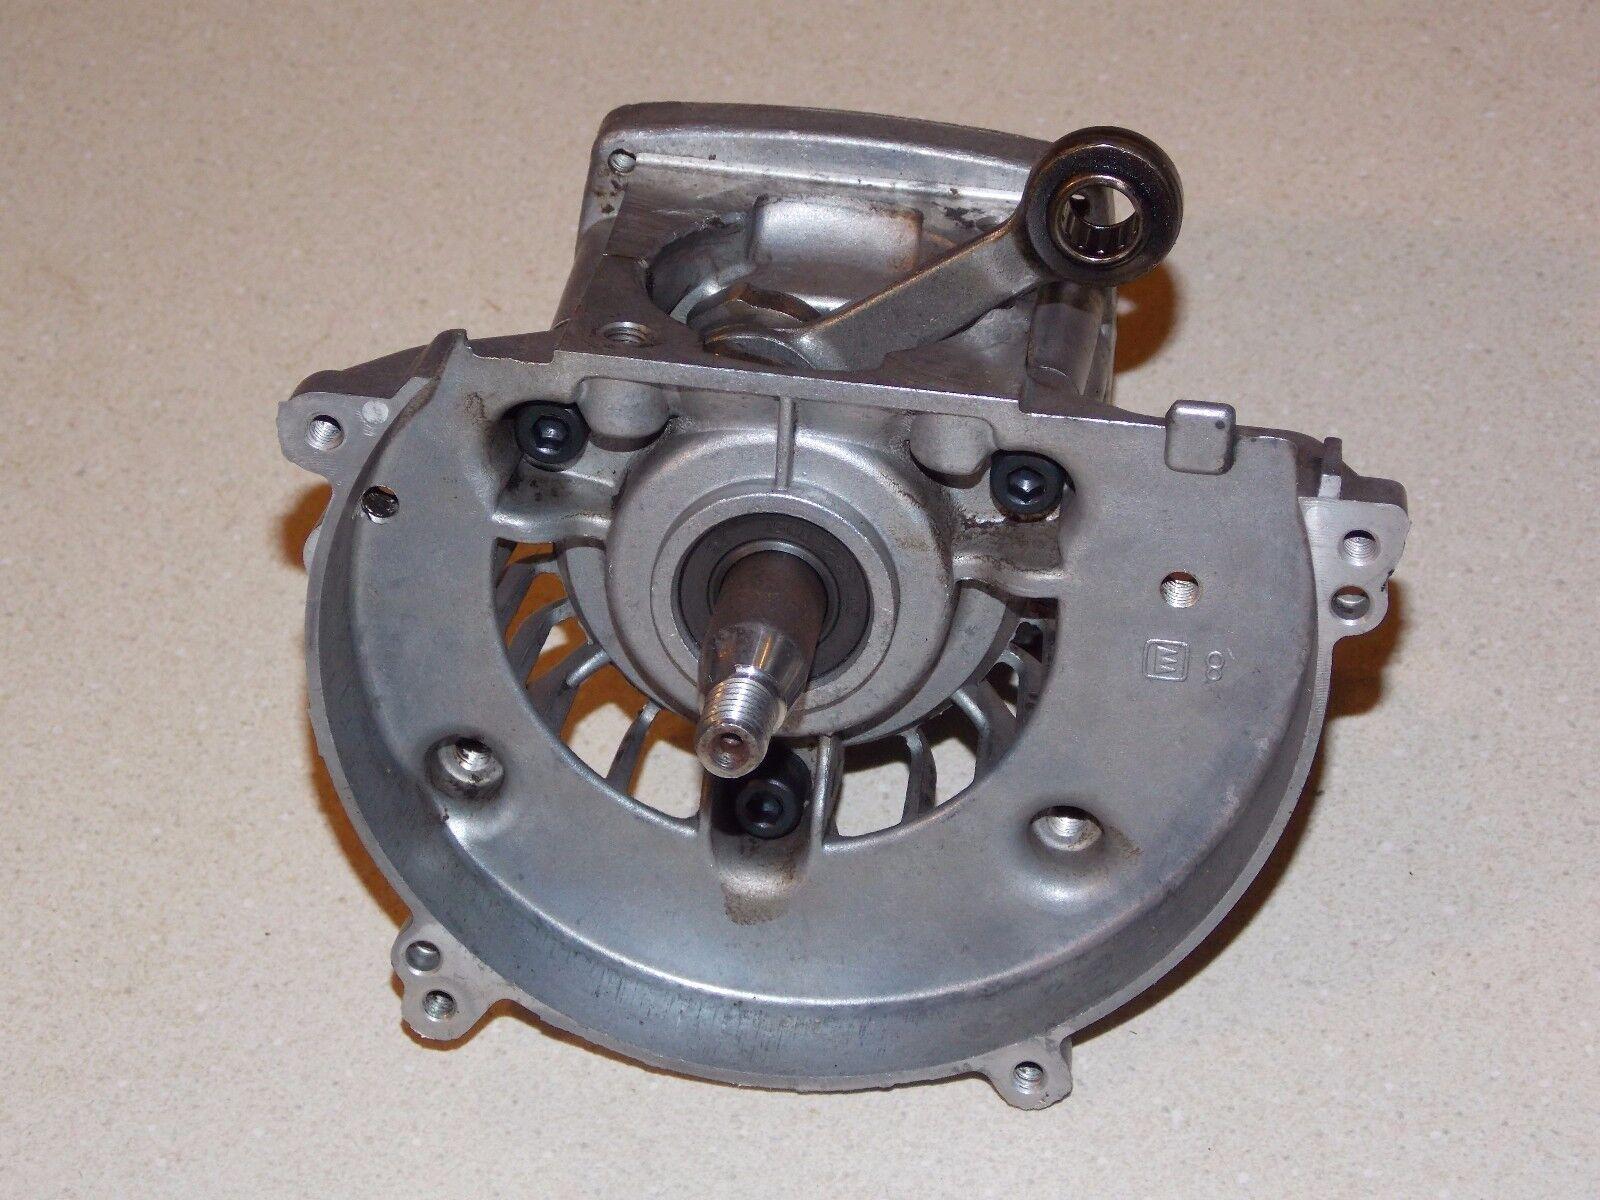 String Trimmer Parts & Accs ECHO SHORTBLOCK REPOWER SB1027 SB1024 MANY MODELS